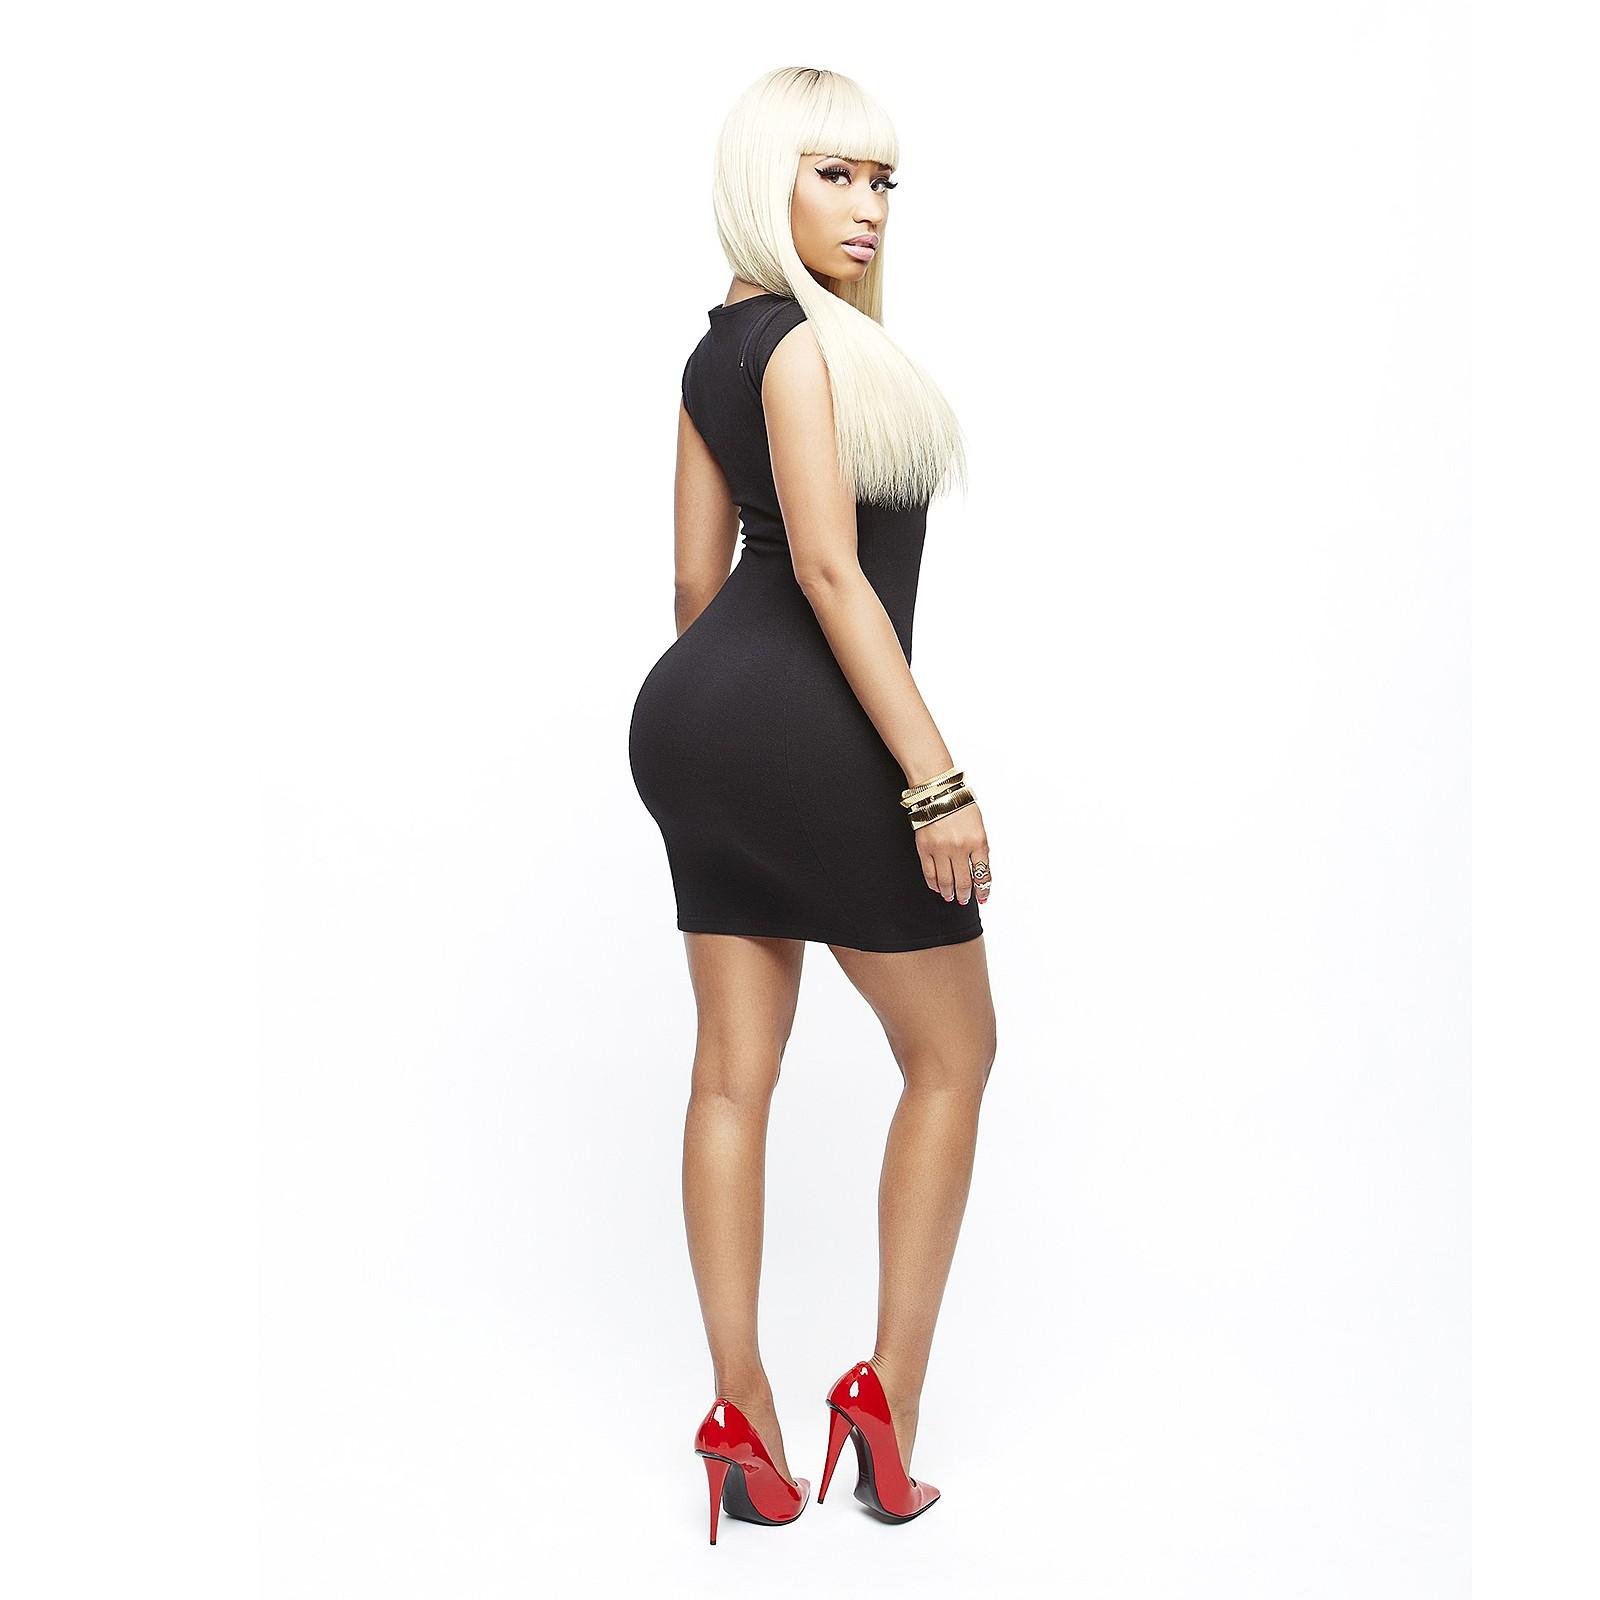 News : Nicki Minaj